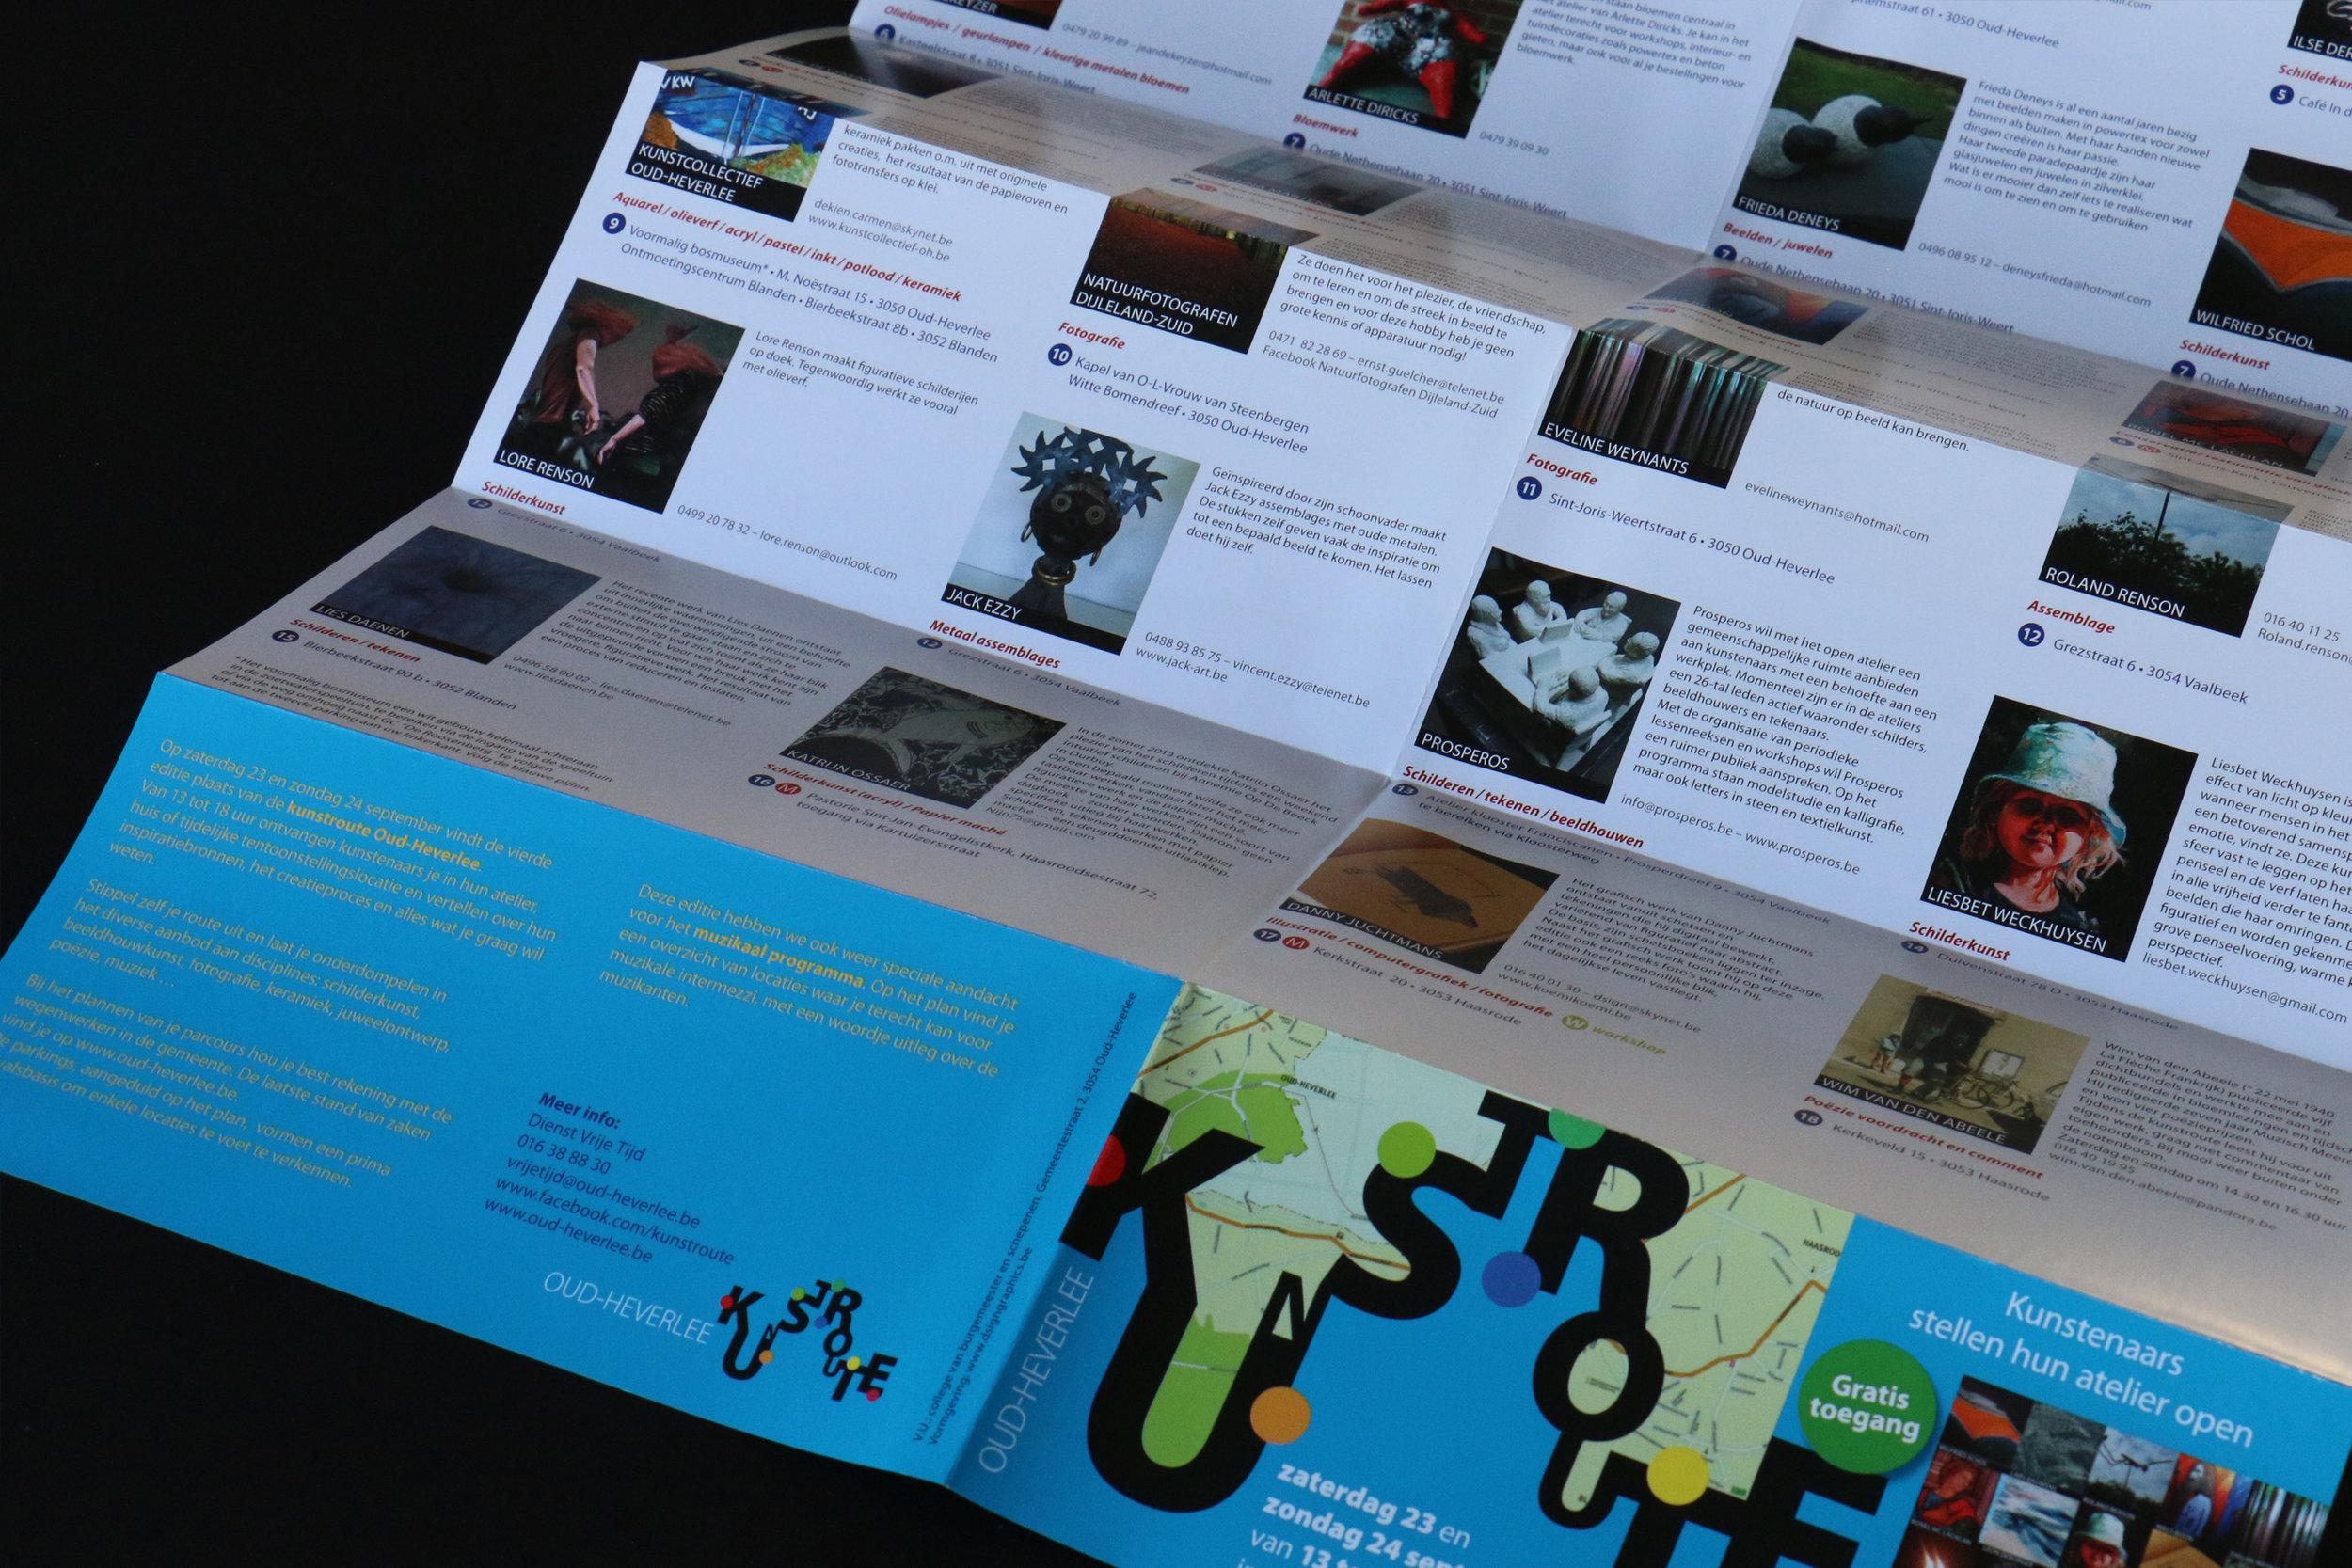 Folder 'Oud-Heverlee Kunstroute'